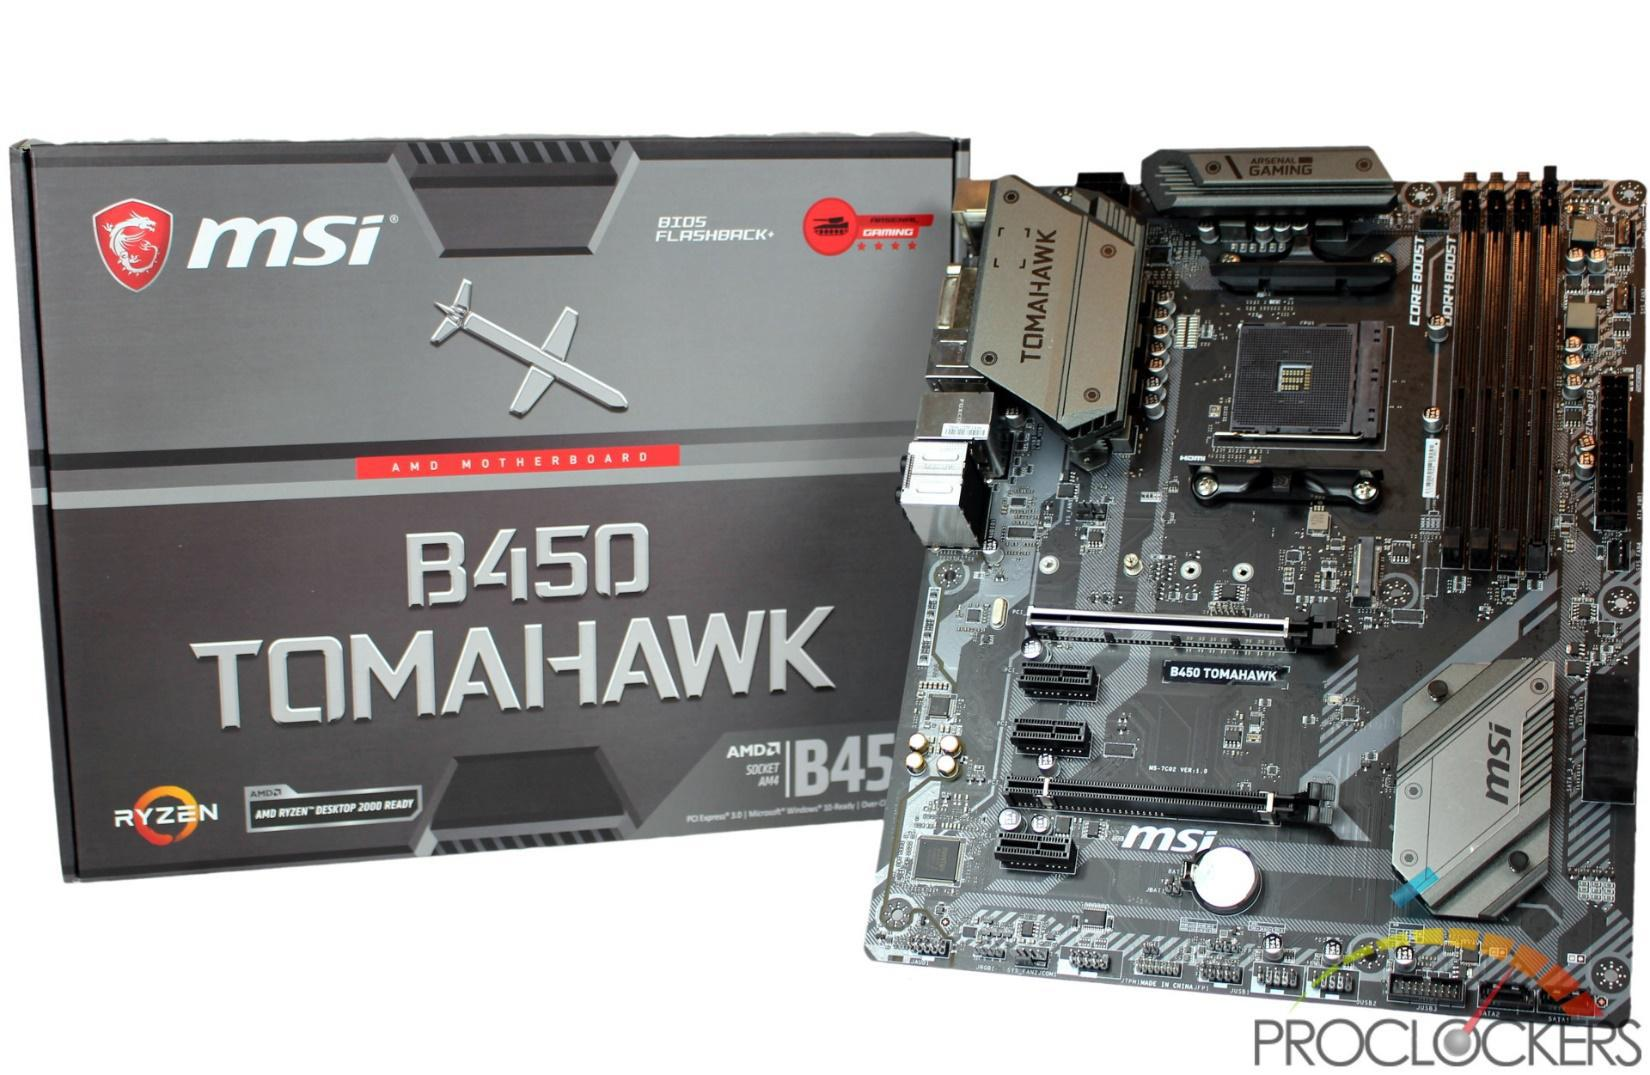 MSI_B450_Tomahawk_01.jpeg